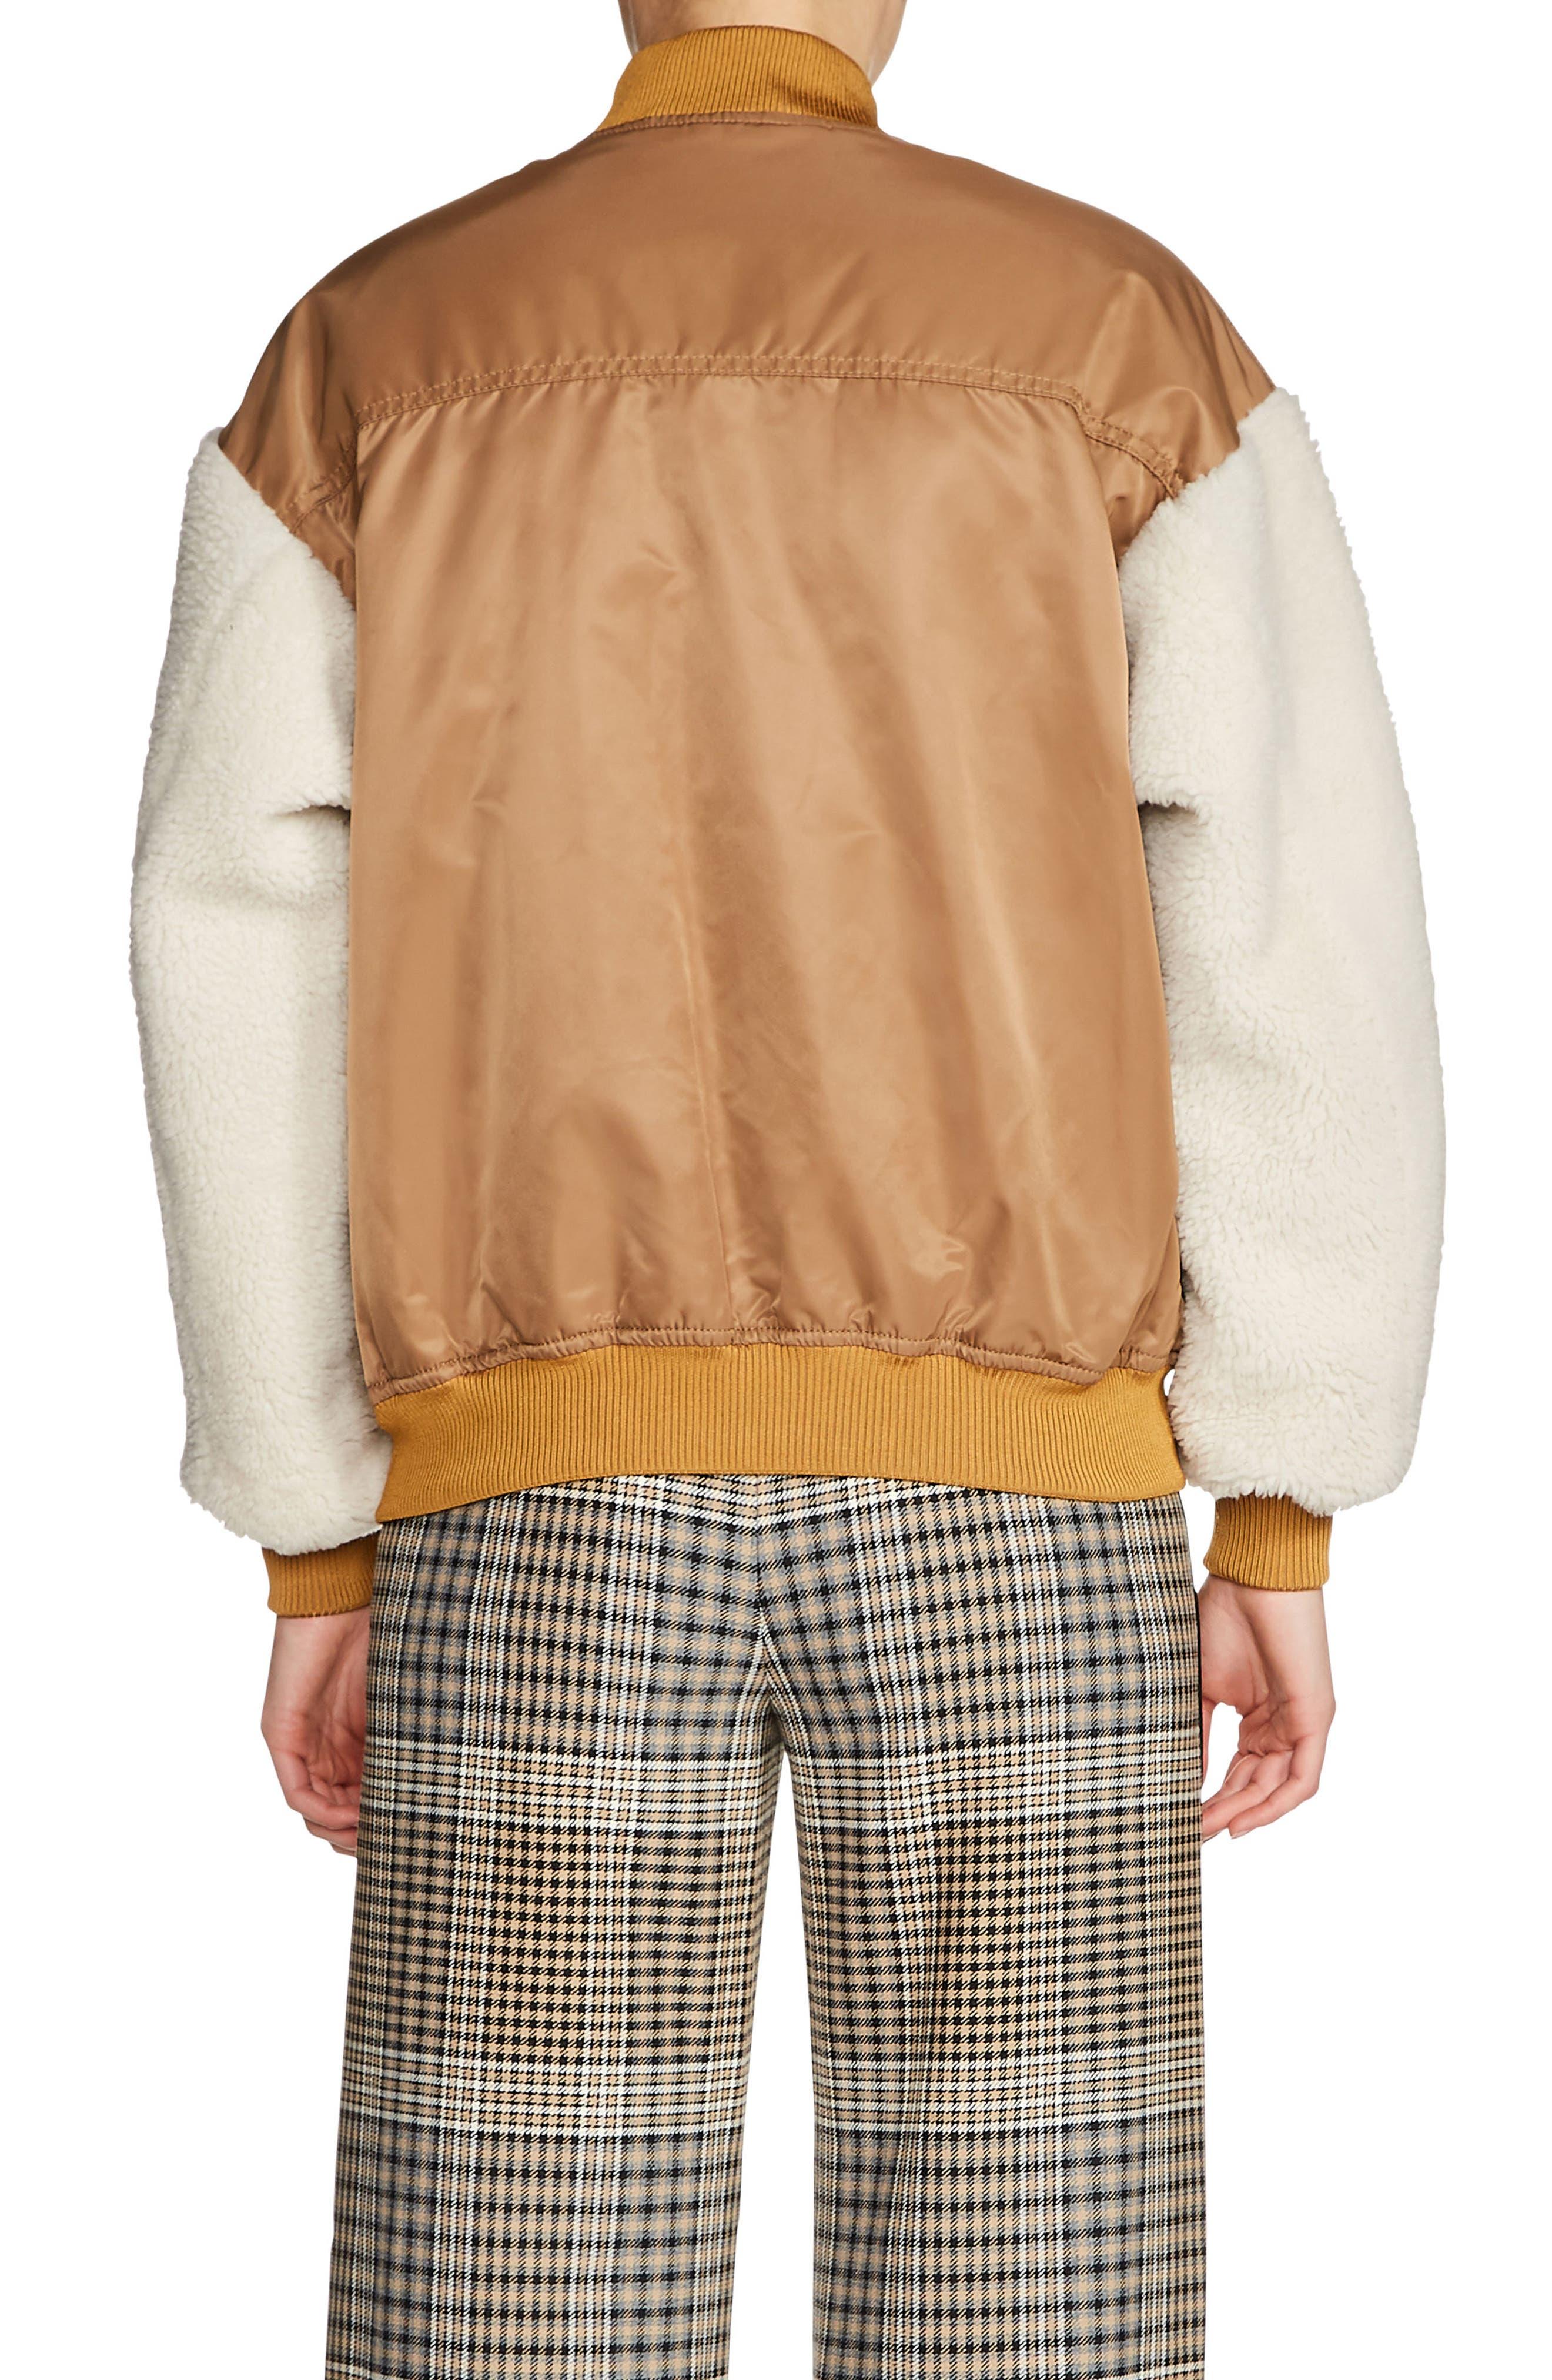 Schott Genuine Shearling Sleeve Bomber Jacket,                             Alternate thumbnail 2, color,                             201